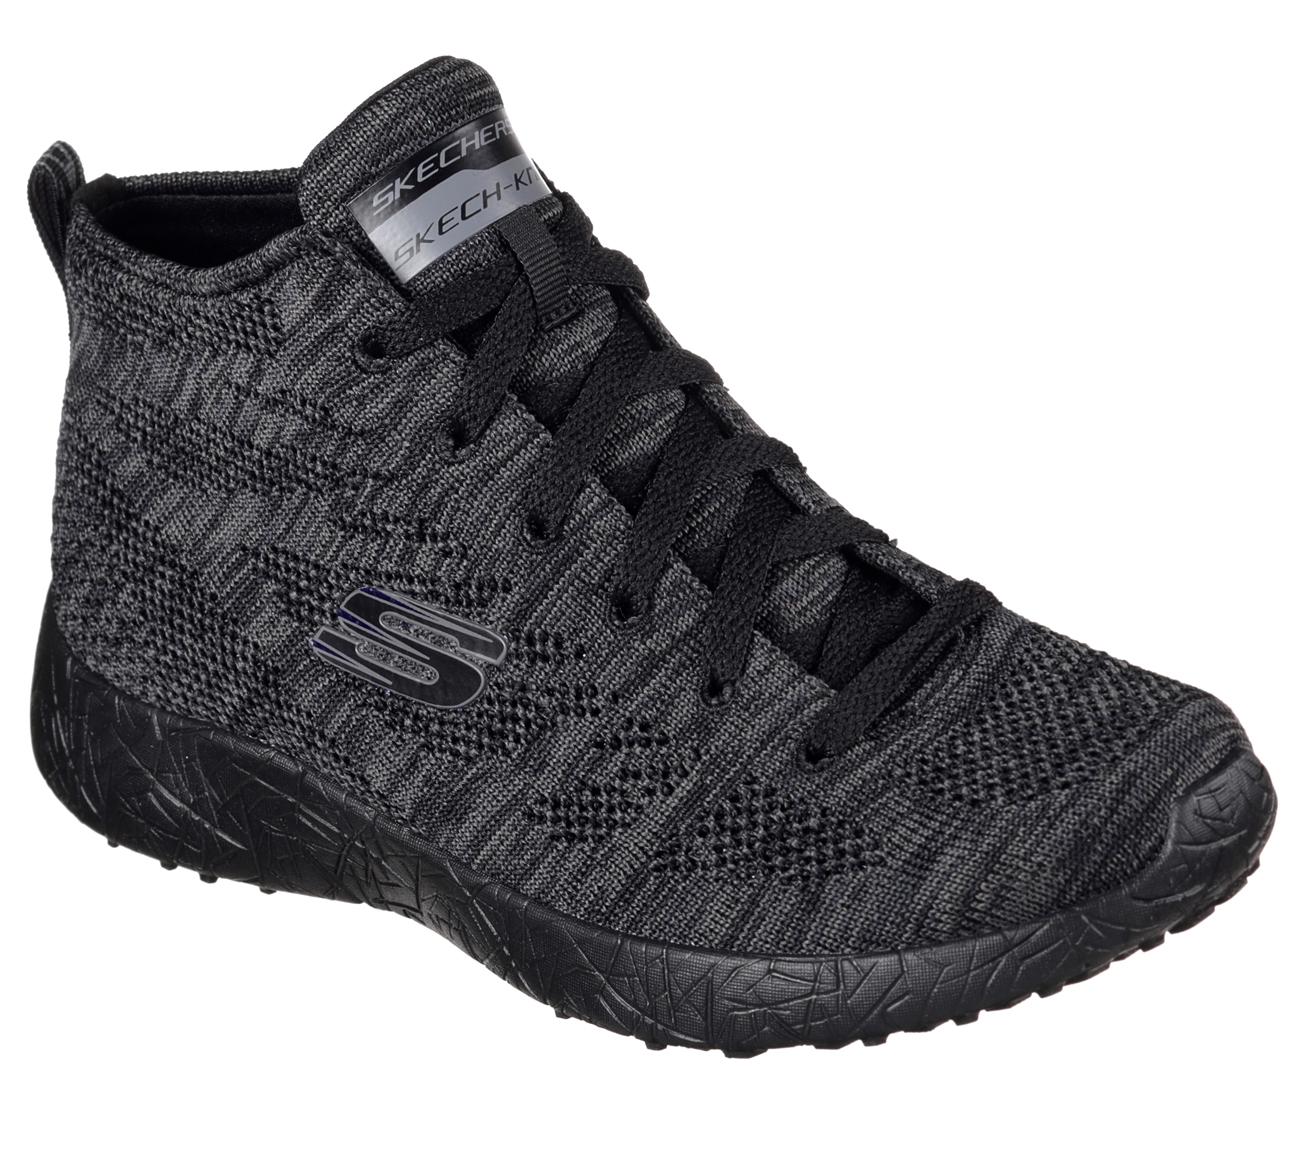 Buy SKECHERS Burst Divergent Sport Shoes Only 7500